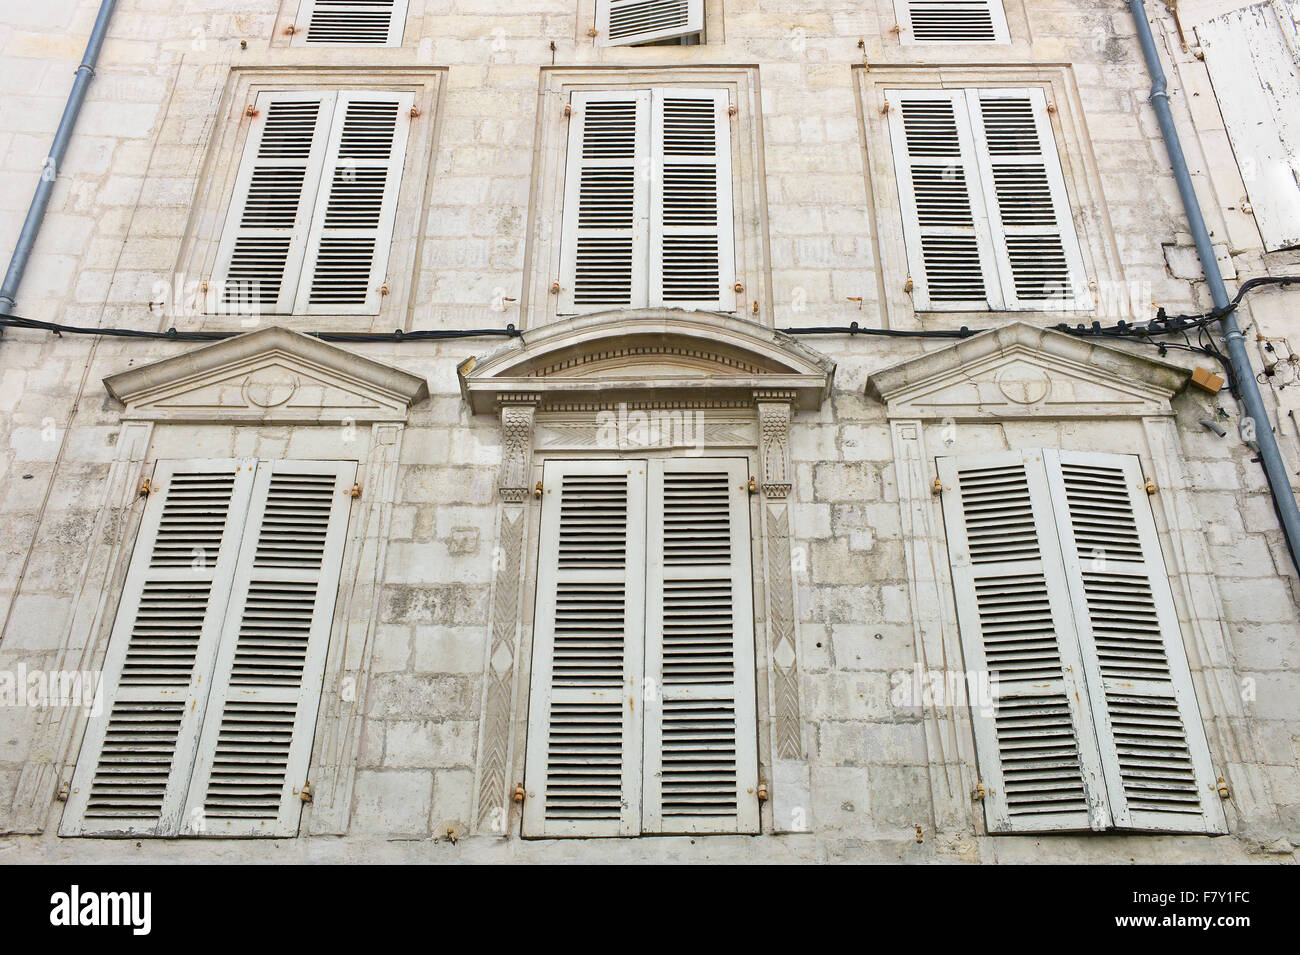 Closed shuttered windows in a building facade, Saintes, Poitou-Charentes, France - Stock Image